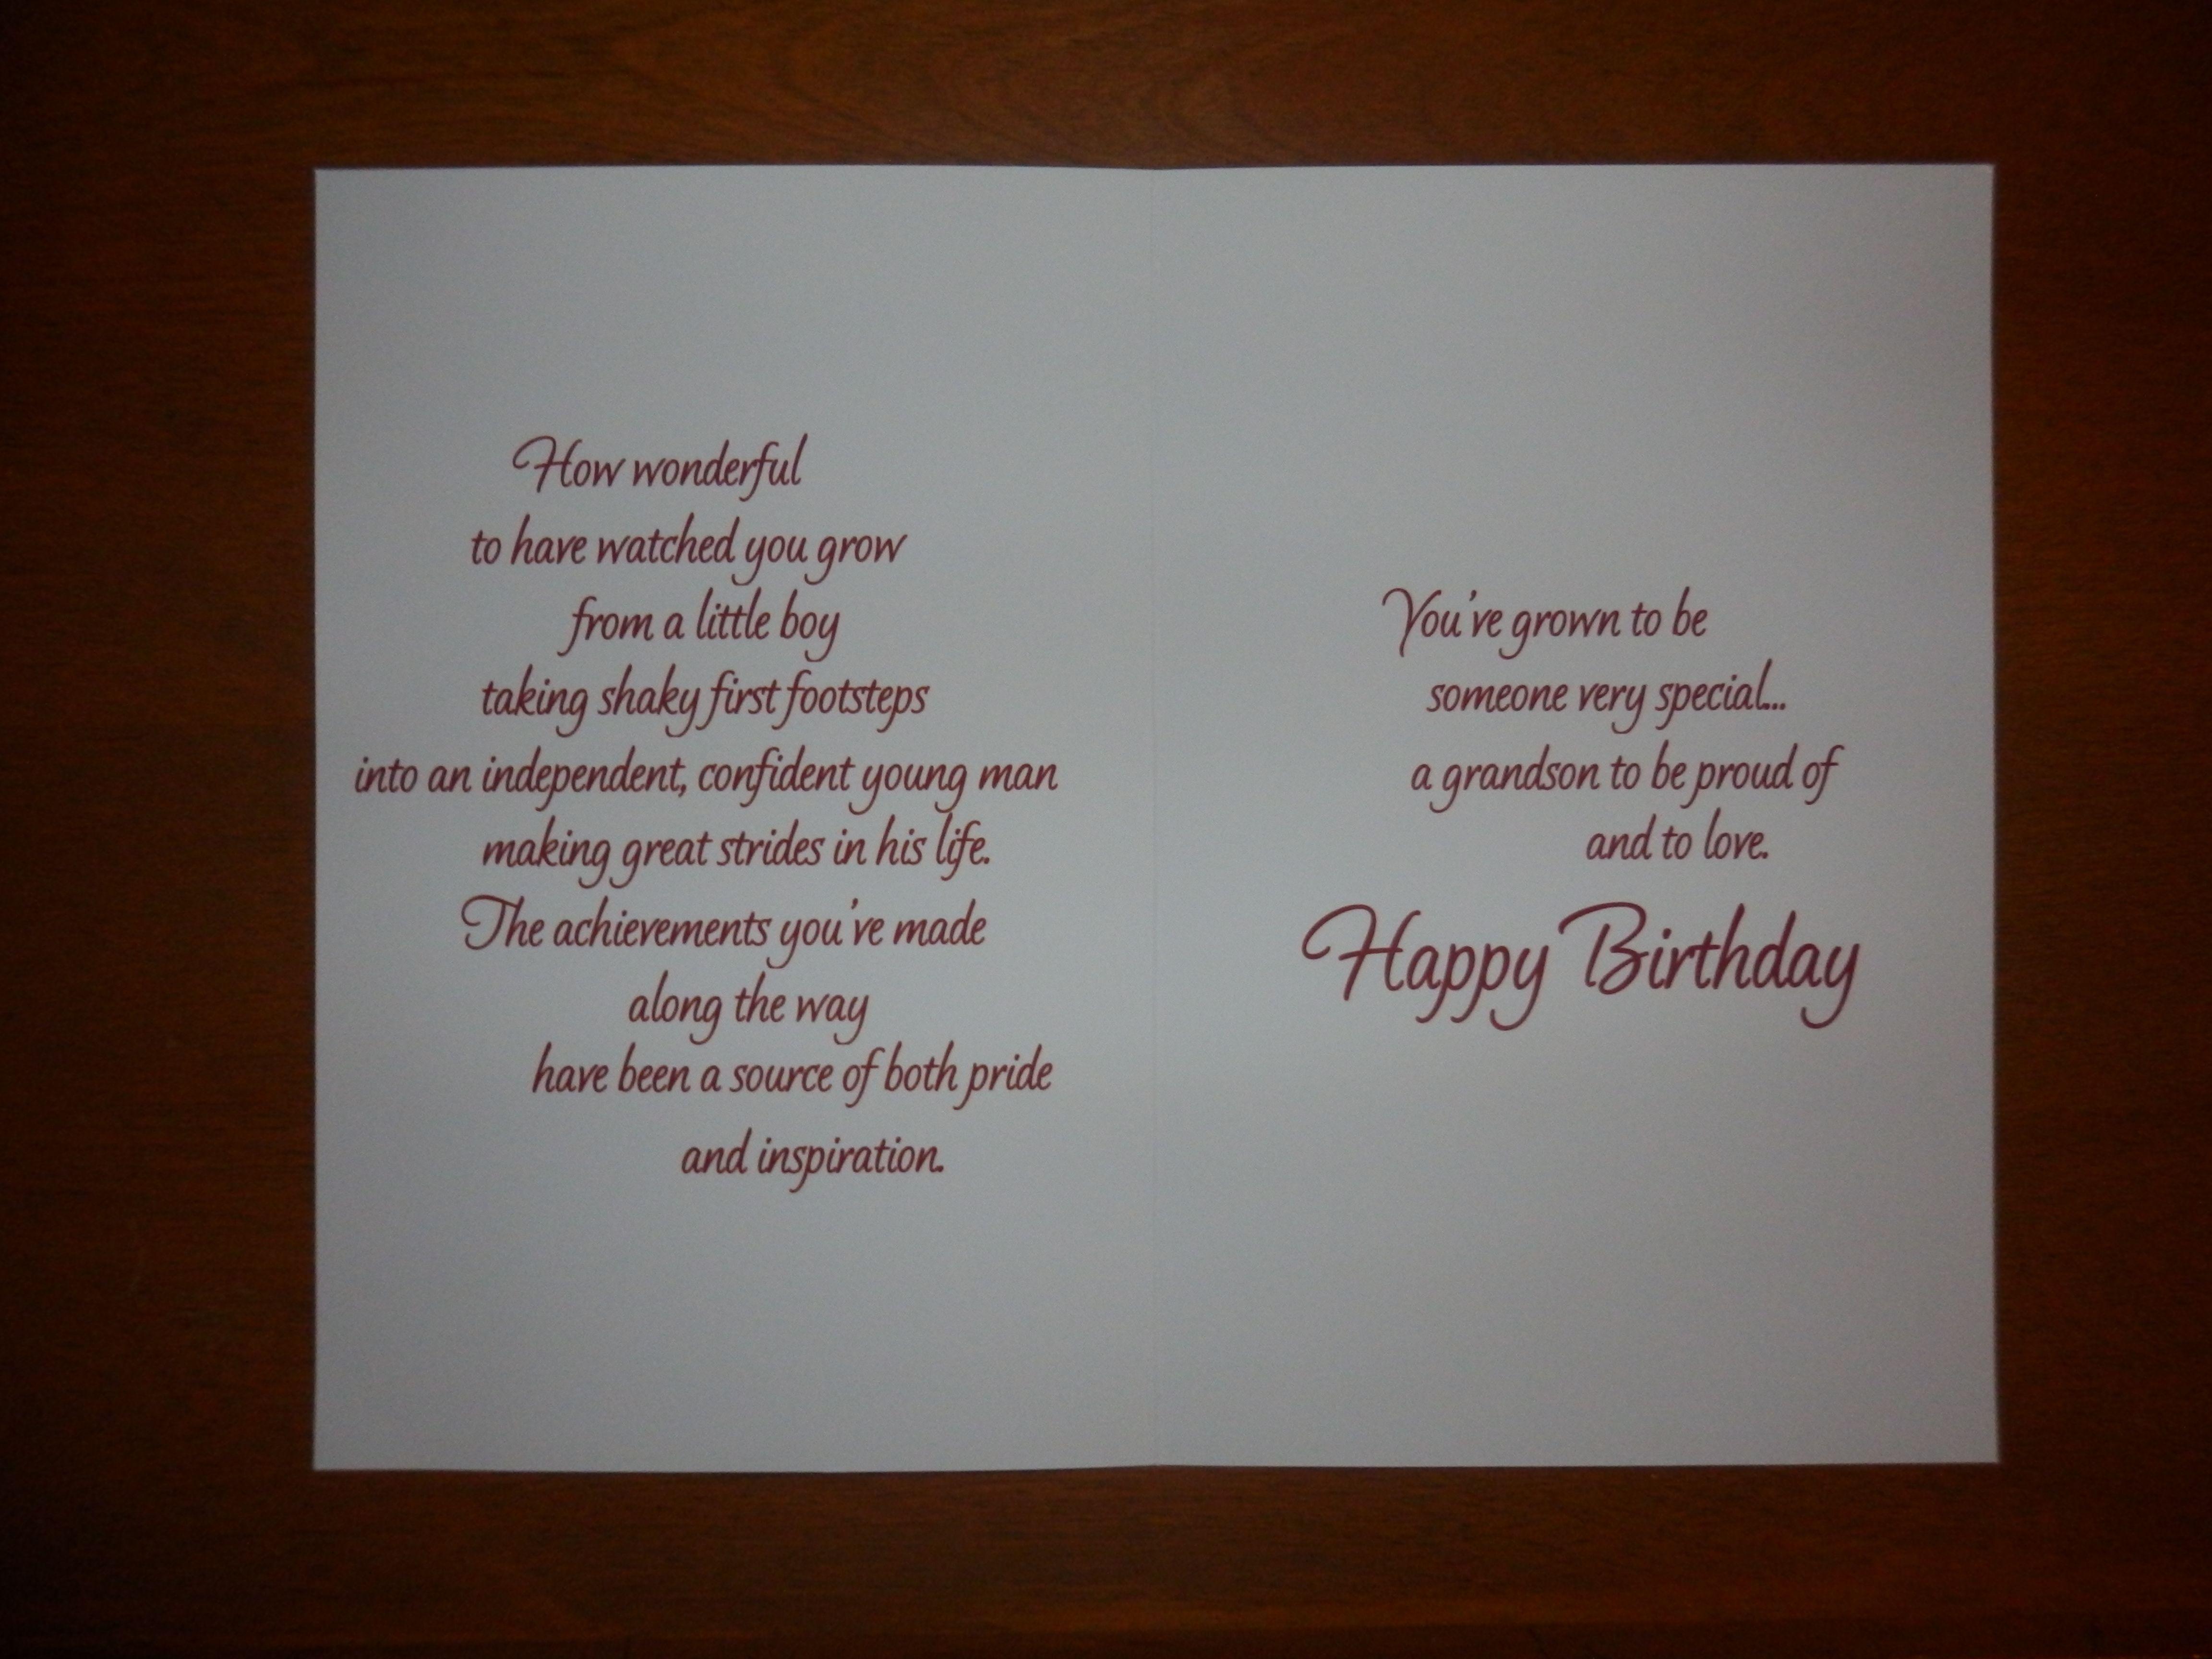 Verse For Golfing Birthday Card Birthday Verses Golf Birthday Cards Verses For Cards